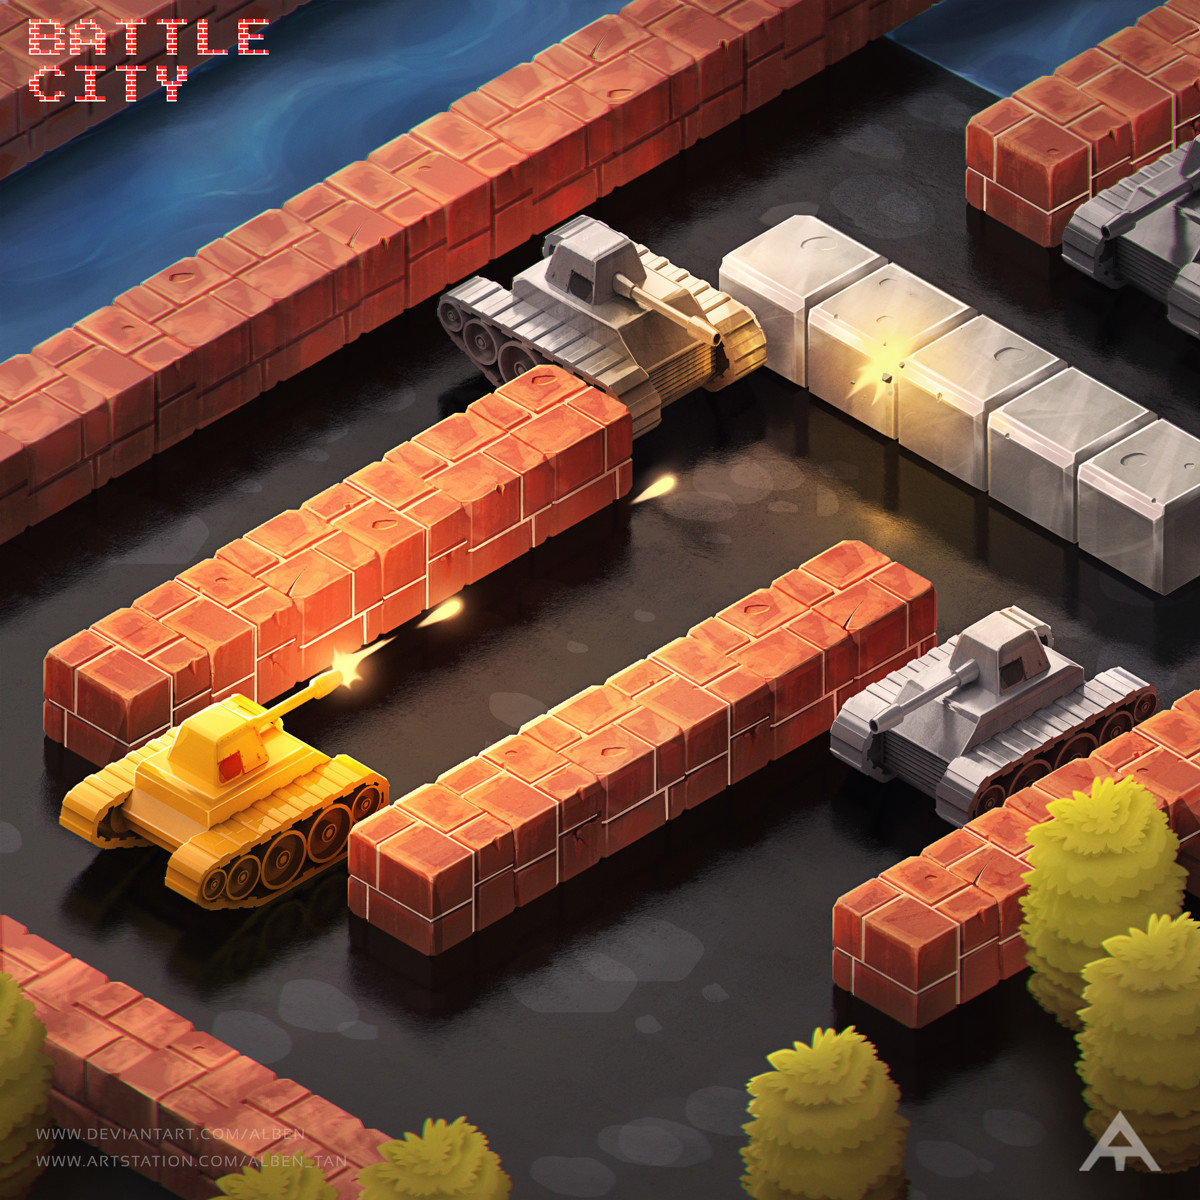 Battle City %D0%98%D0%B3%D1%80%D1%8B-battle-city-%D0%B0%D1%80%D1%82-Alben-Tan-5452248